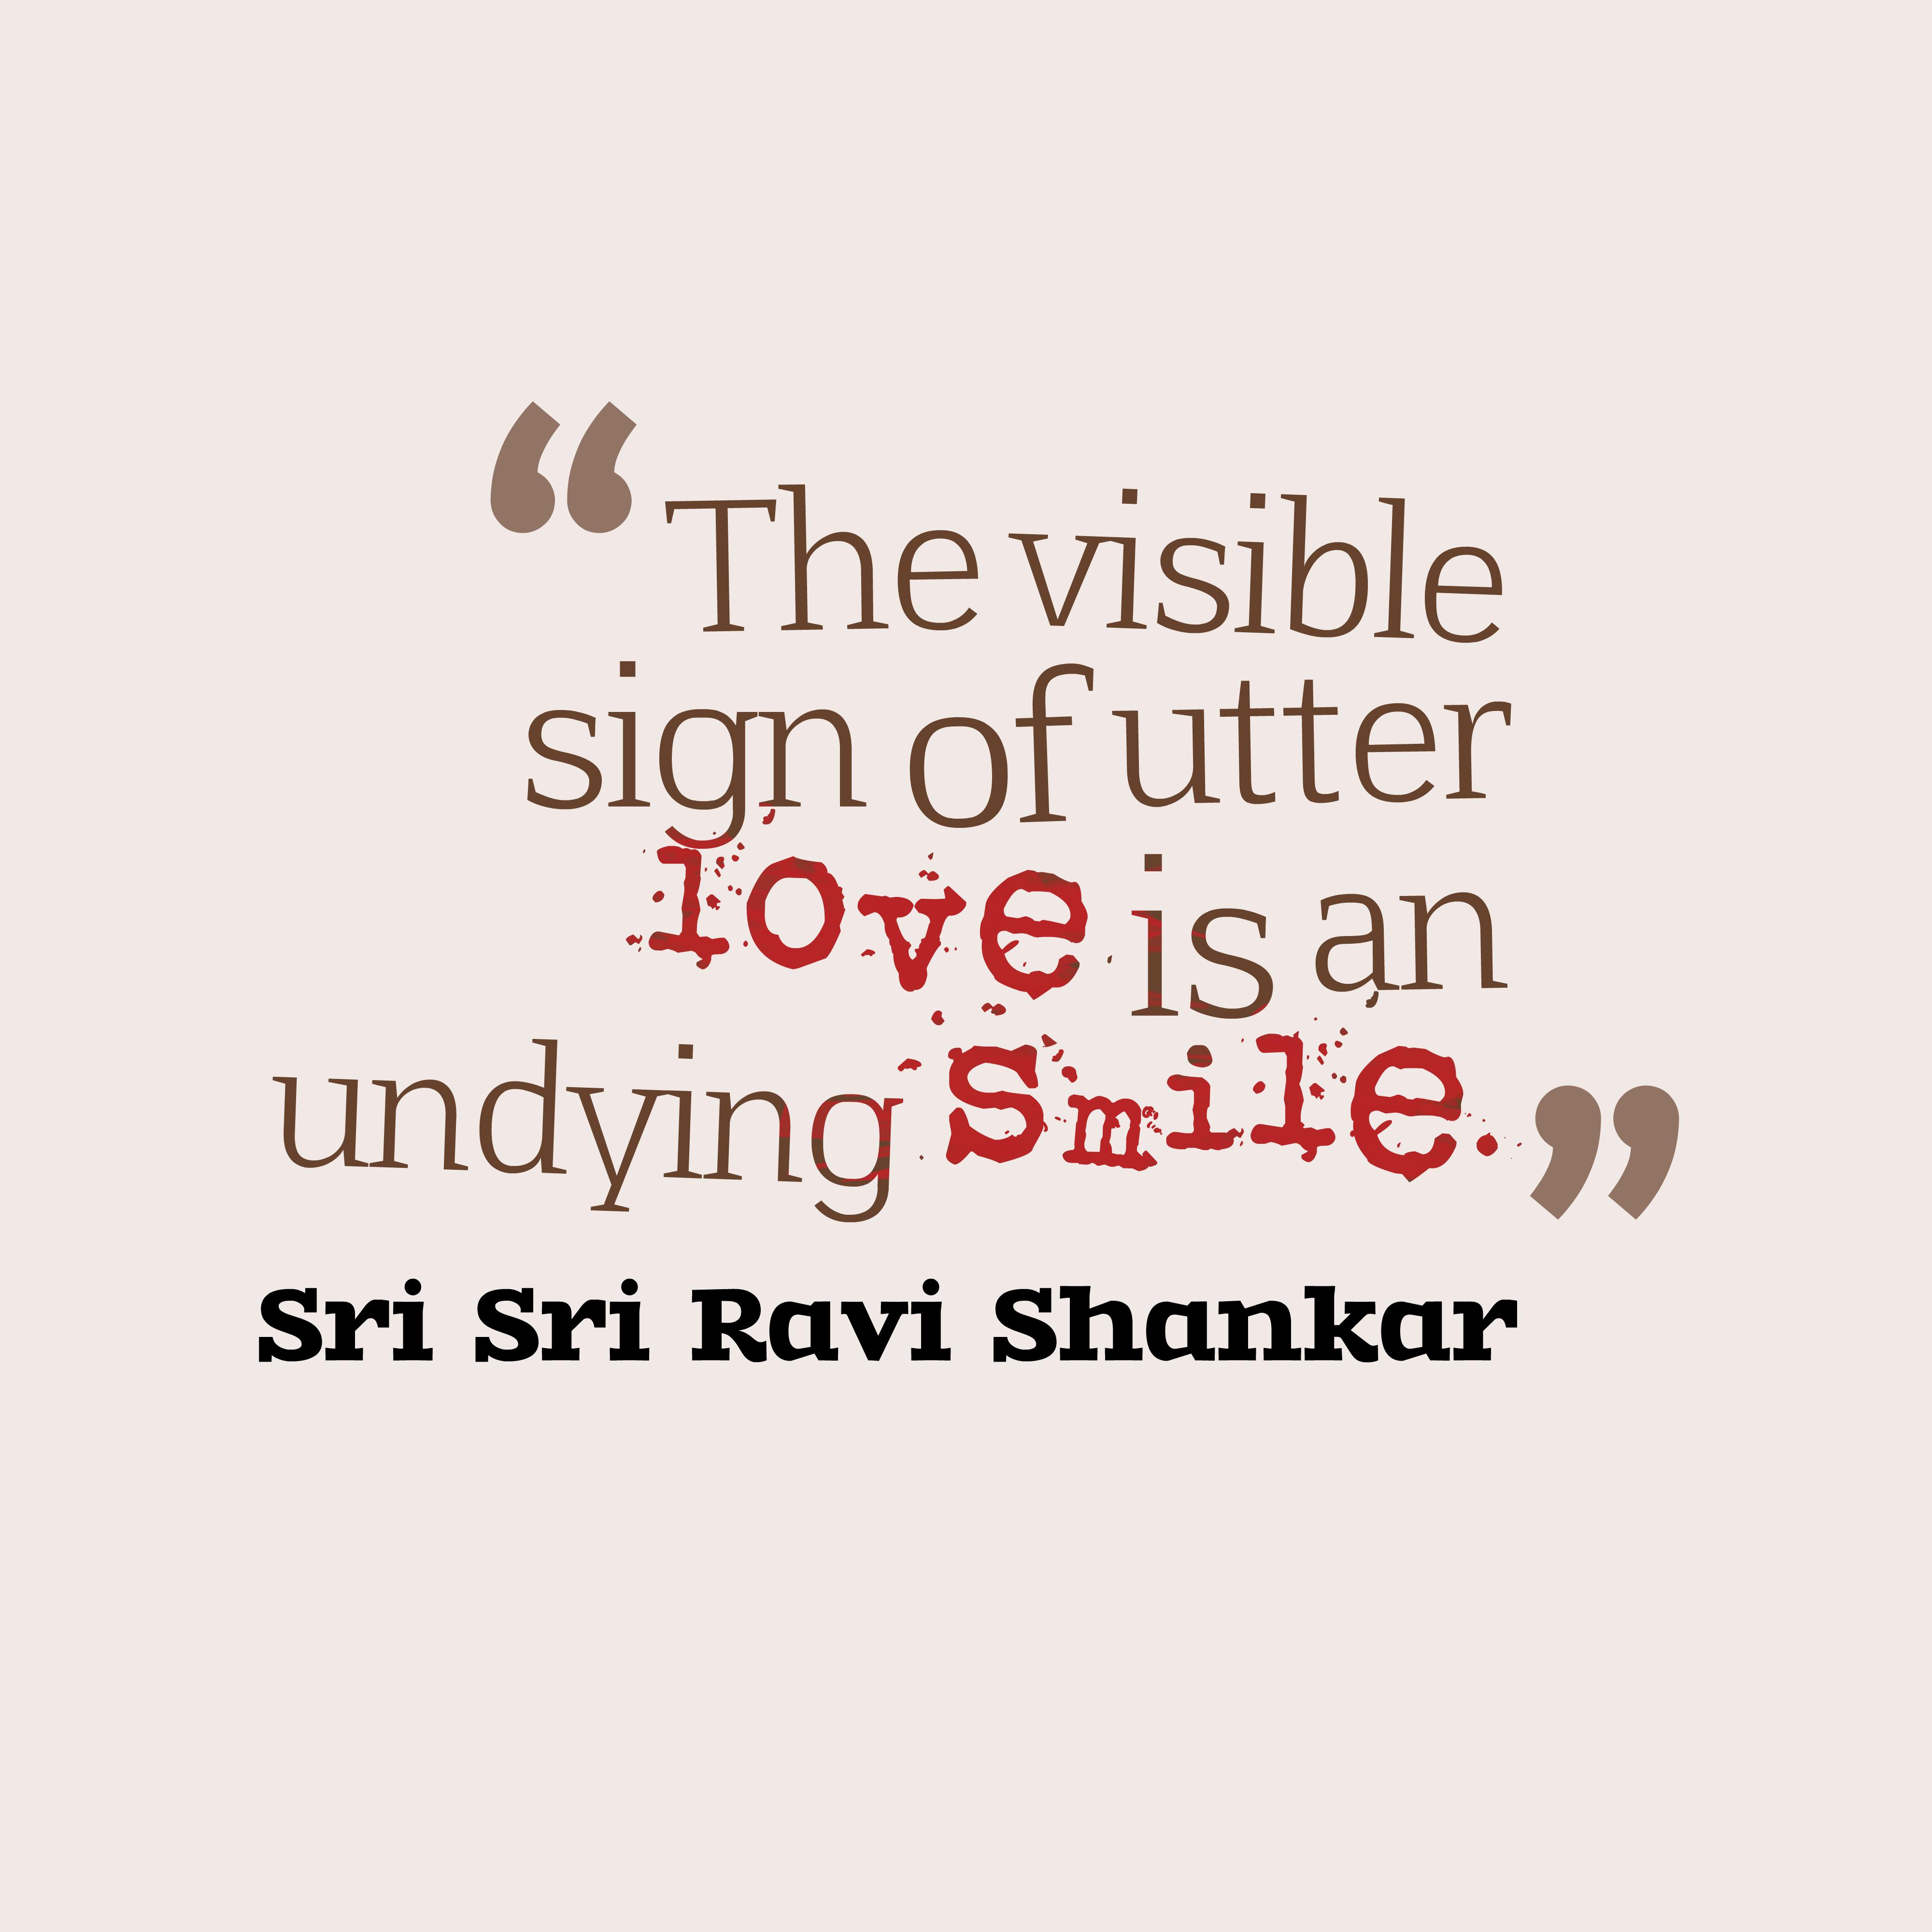 Sri Sri Ravi Shankar Quote About Smile